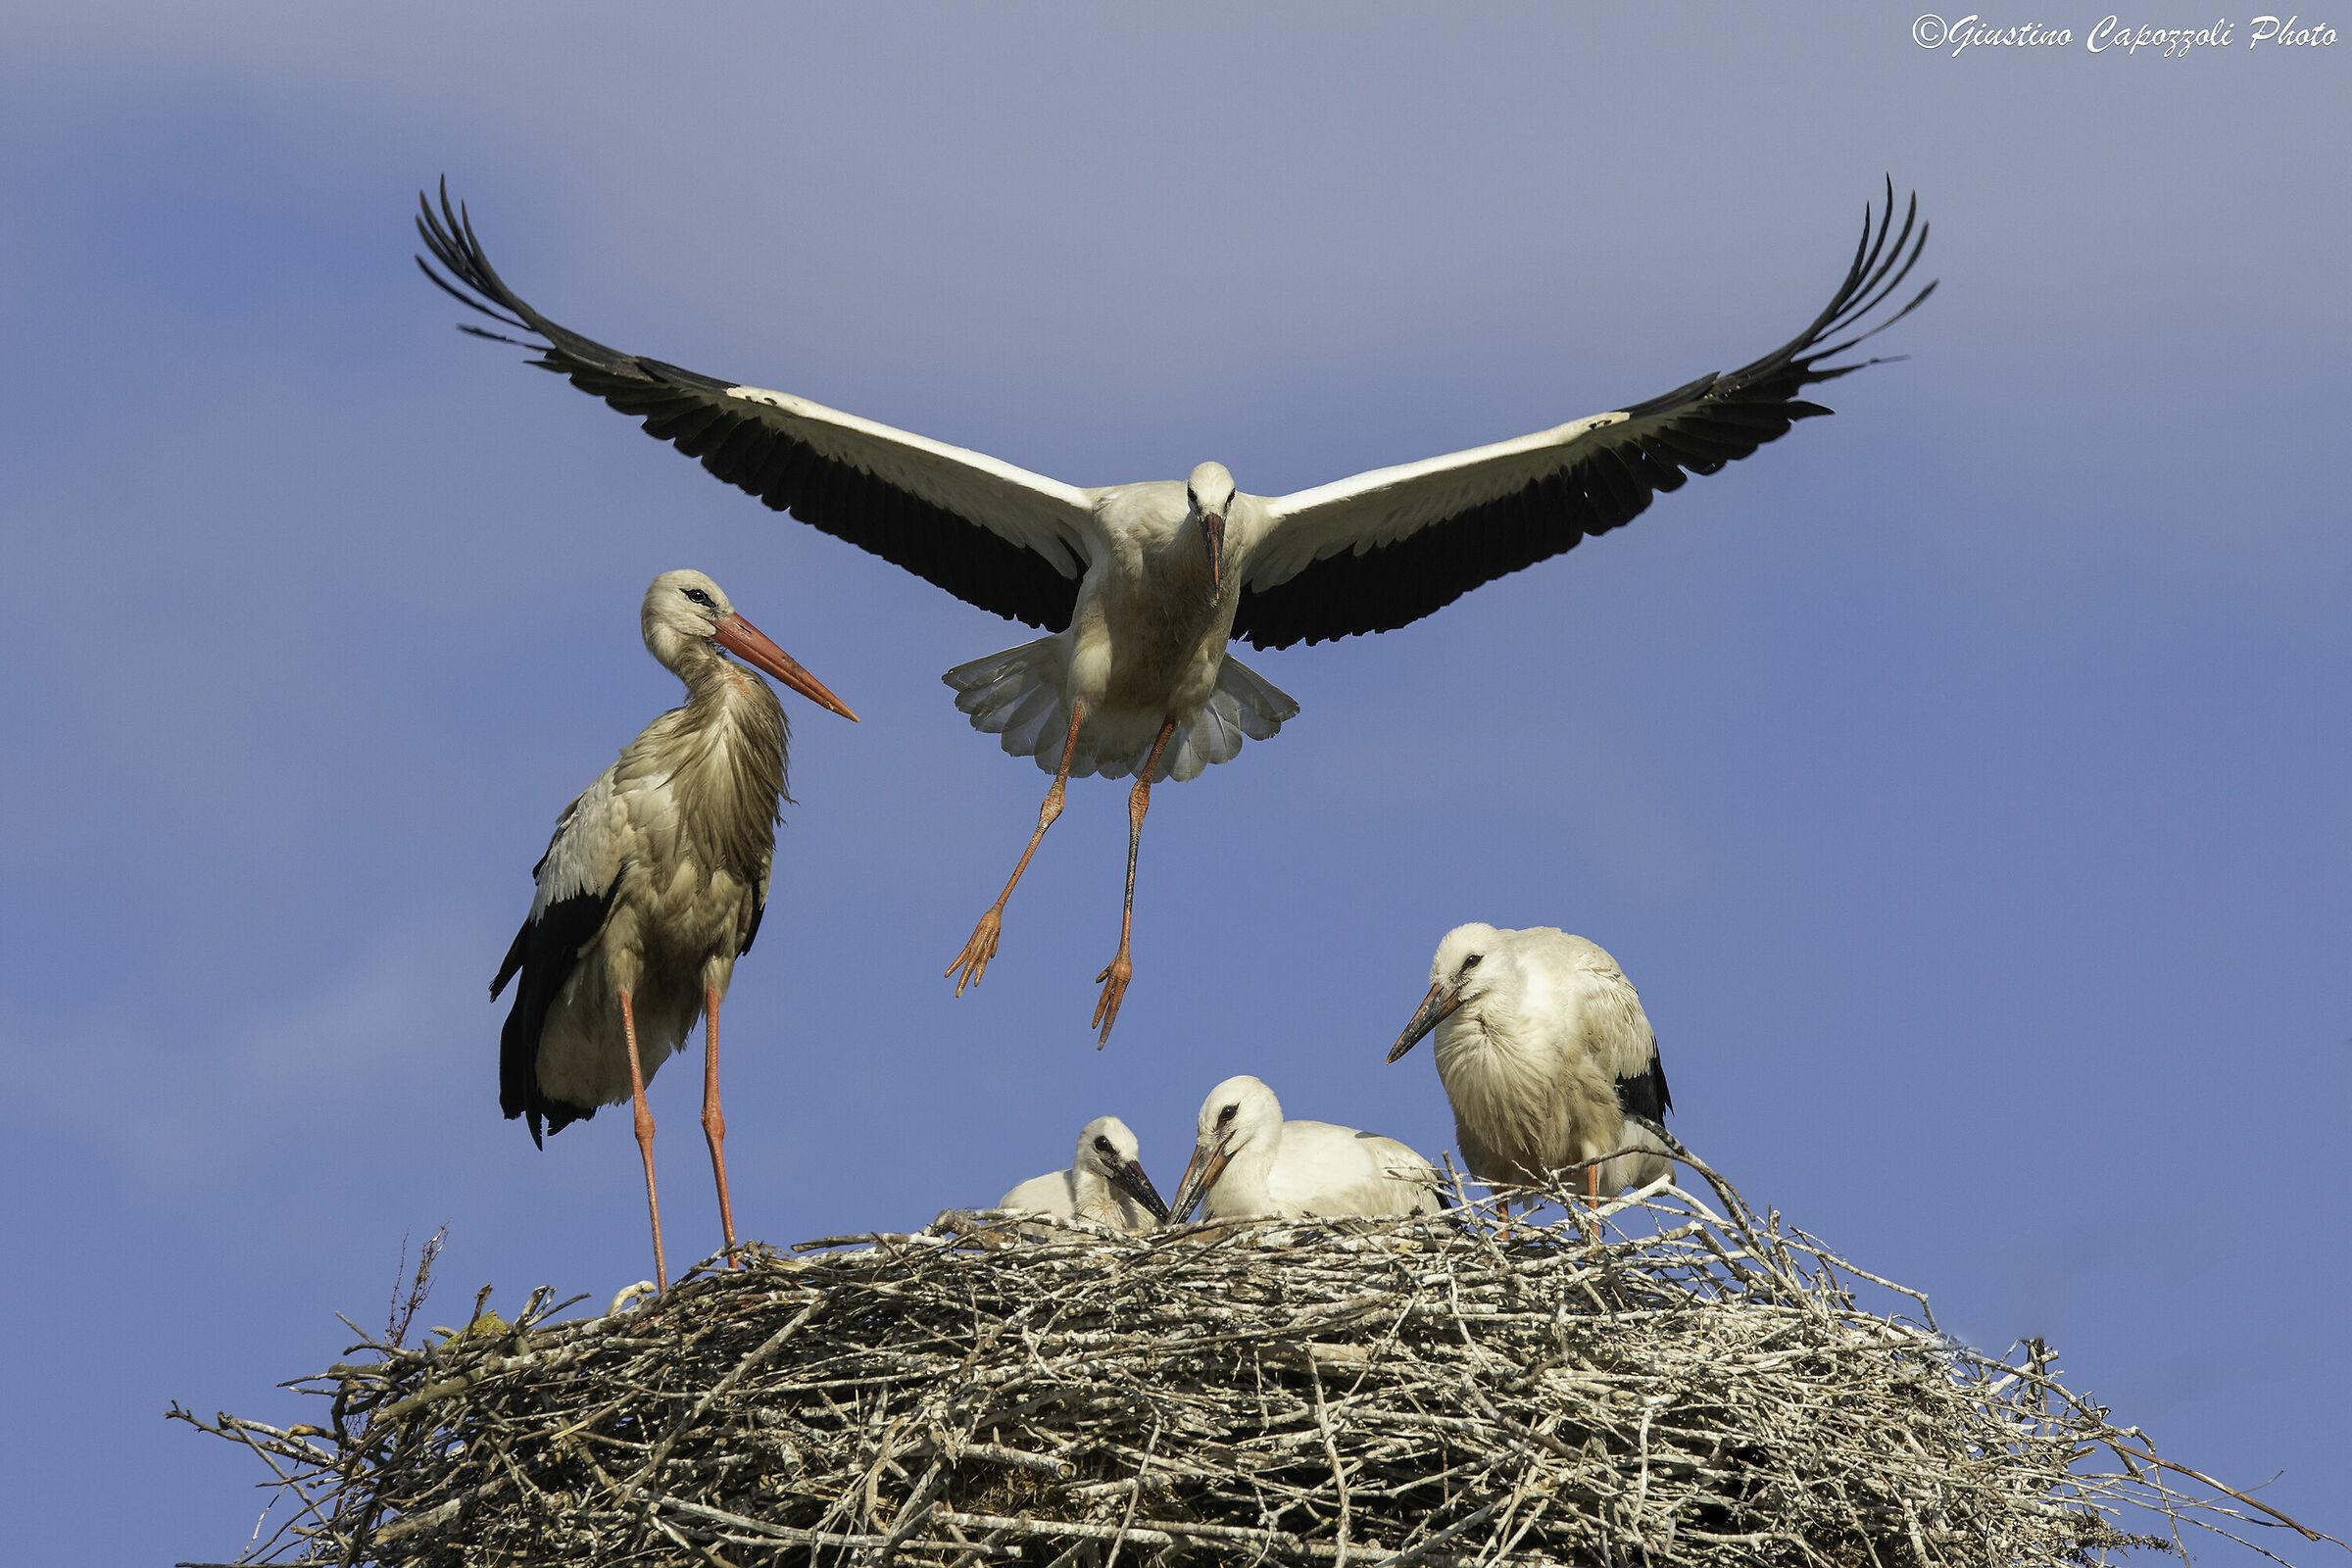 Mother Stork, flying lessons ...